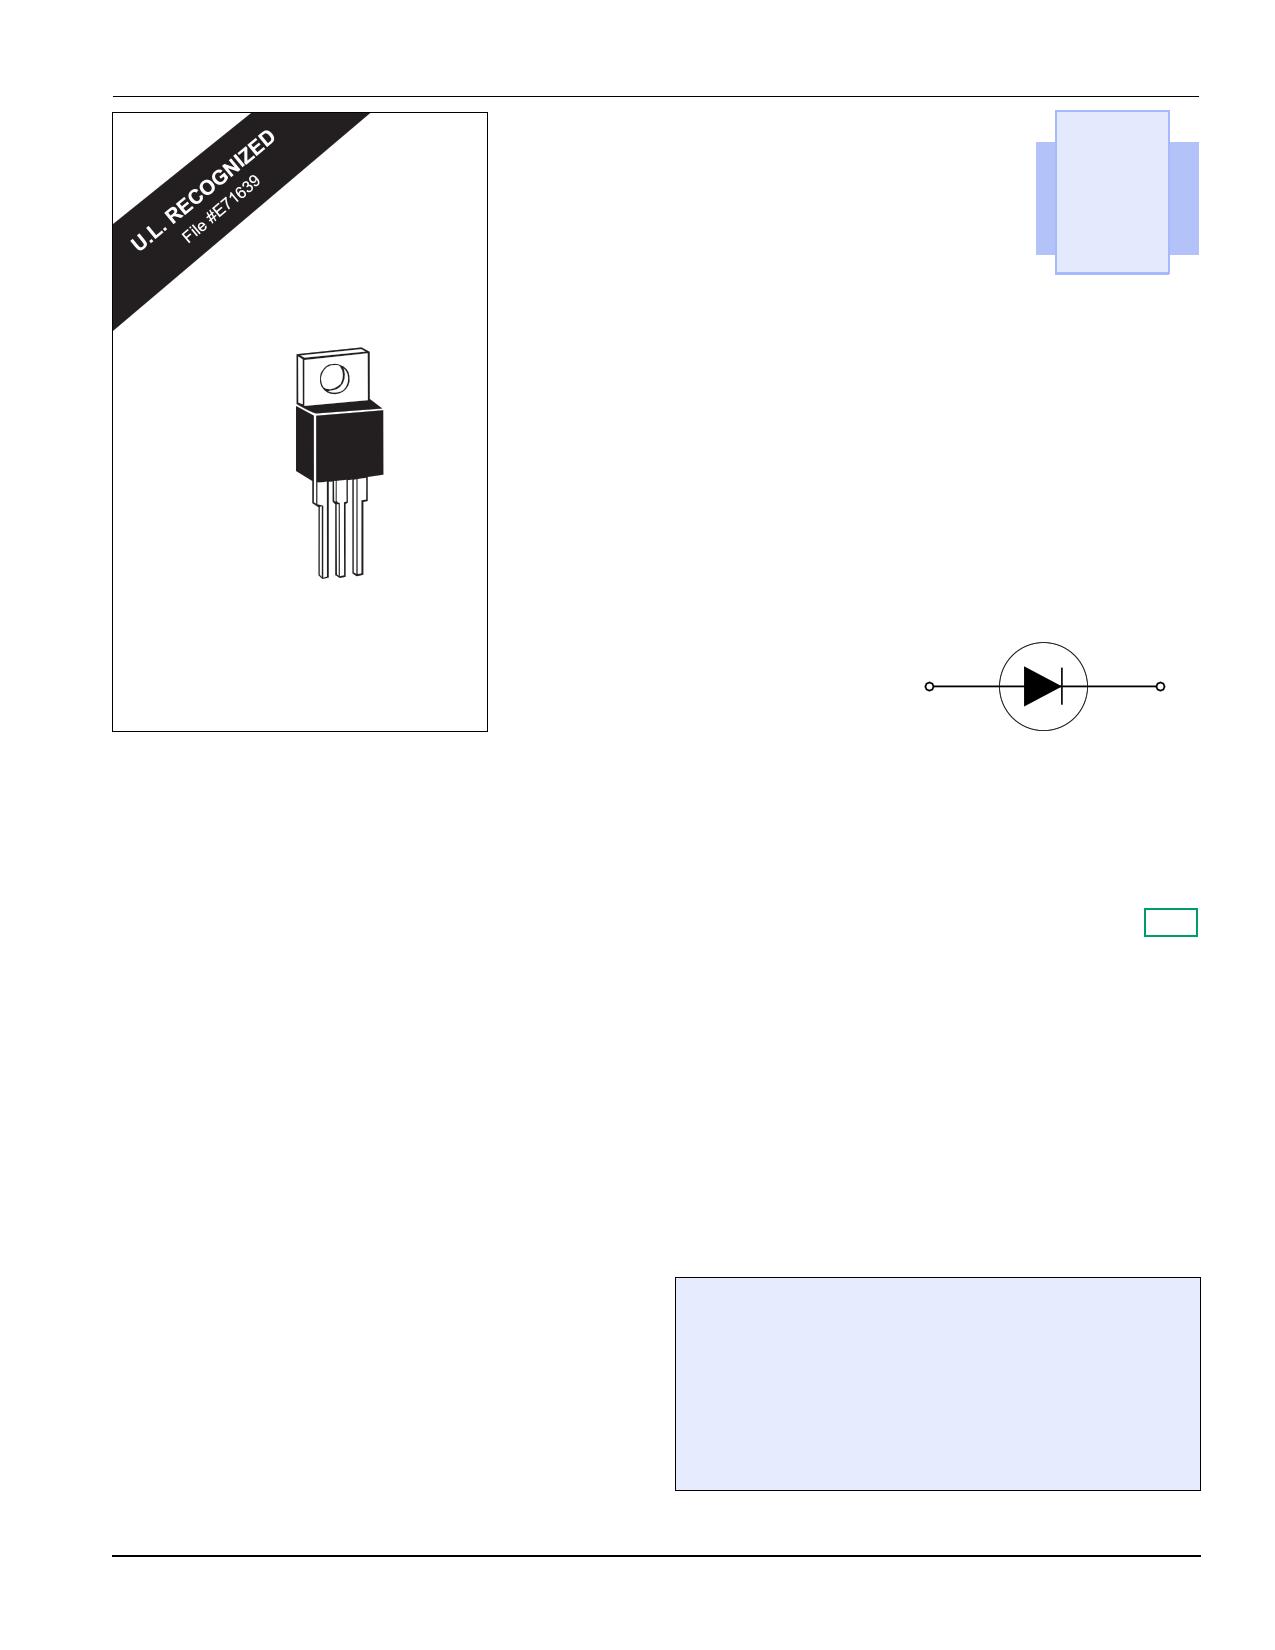 D2025L datasheet